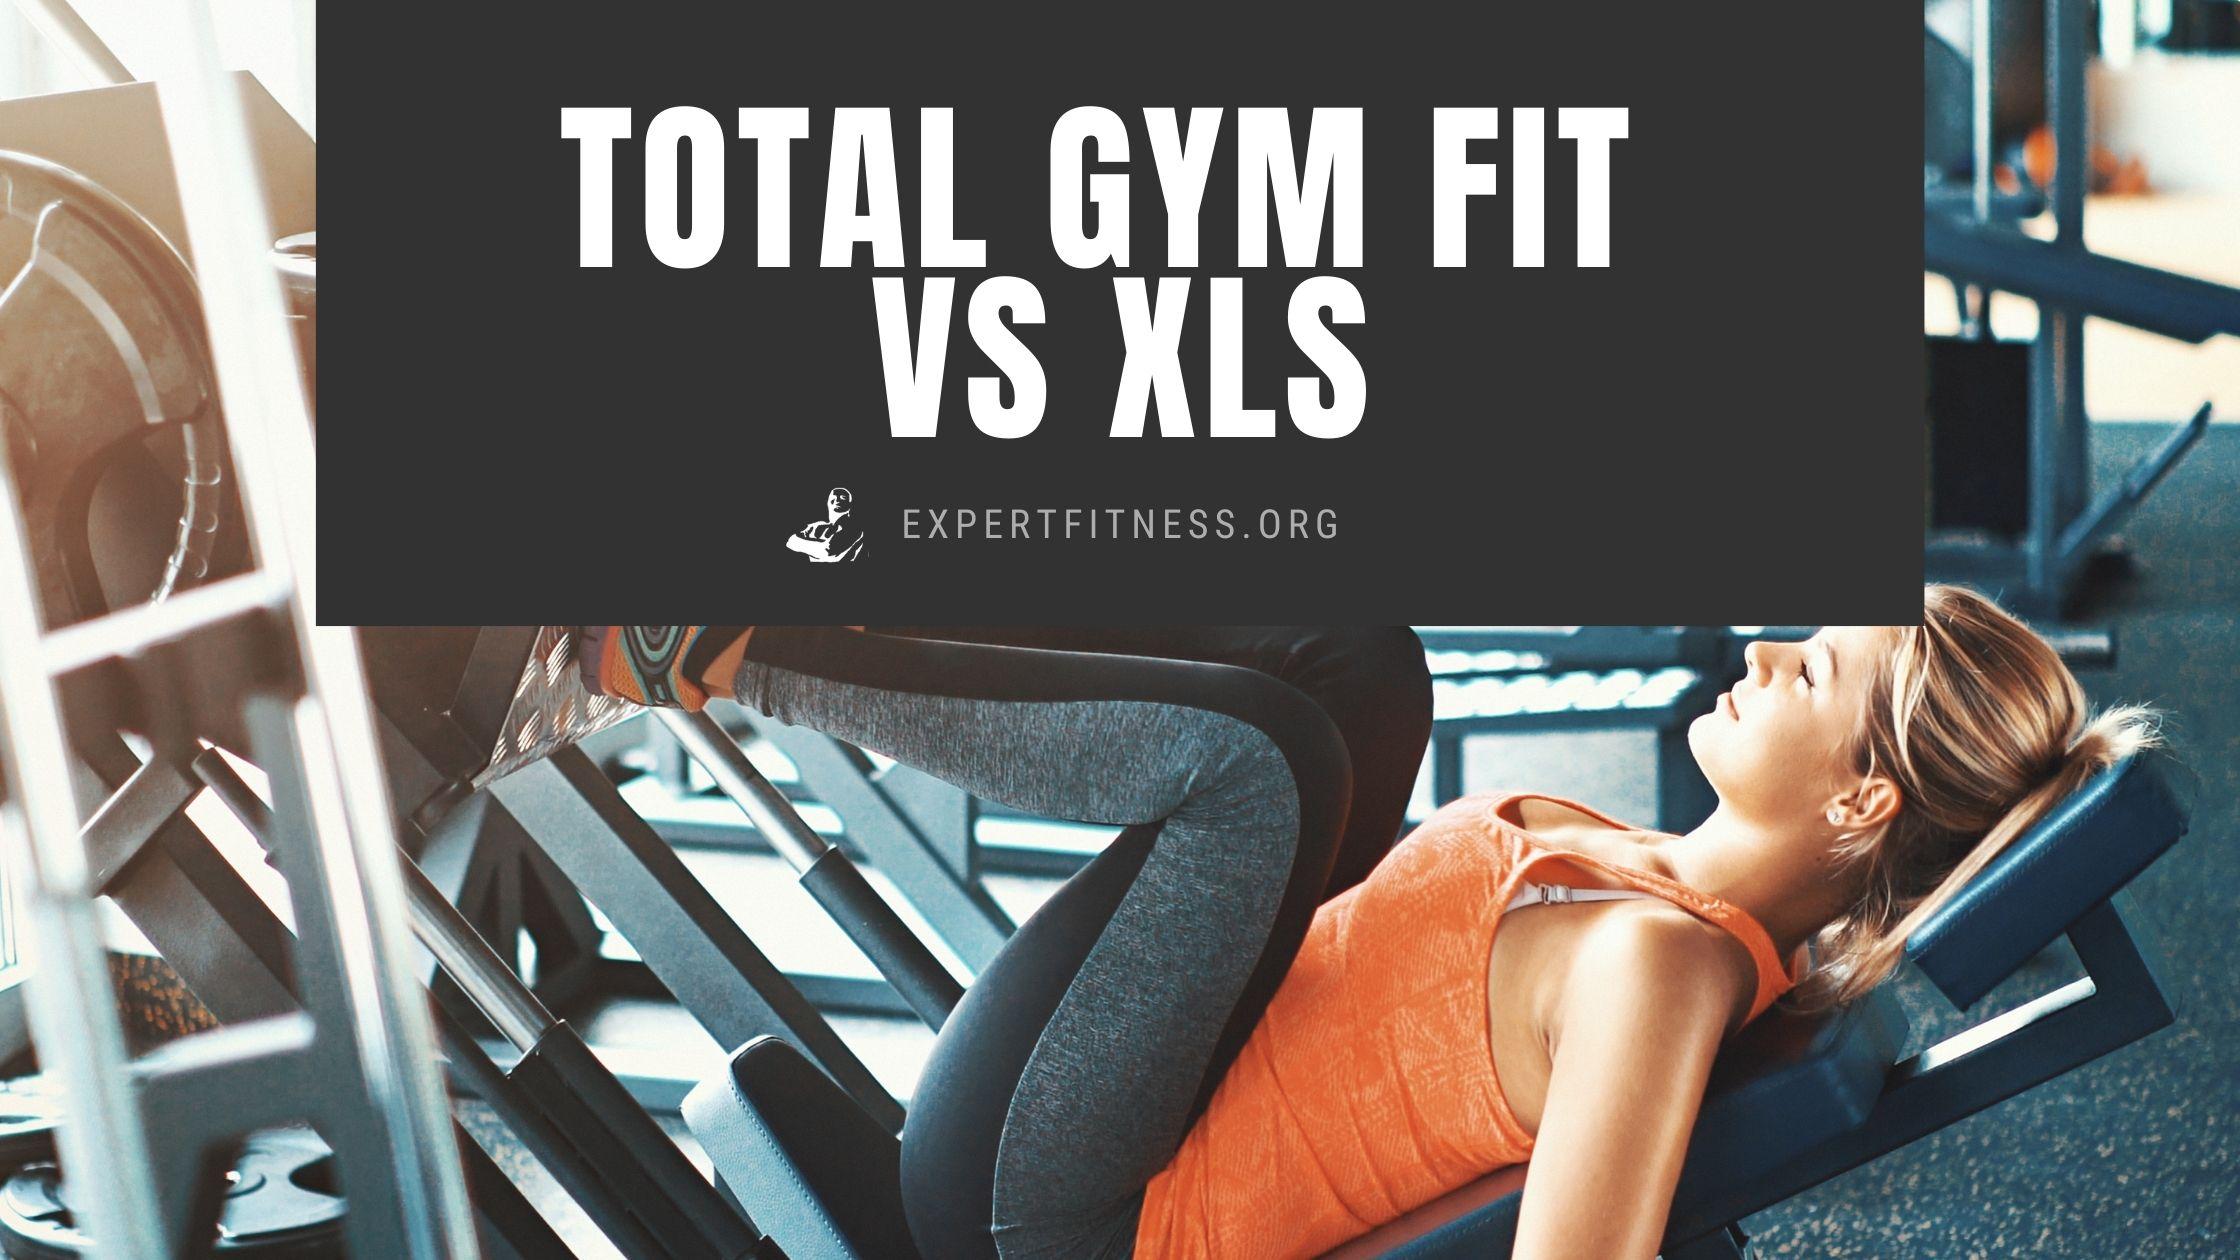 EF- Total gym fit vs XLS